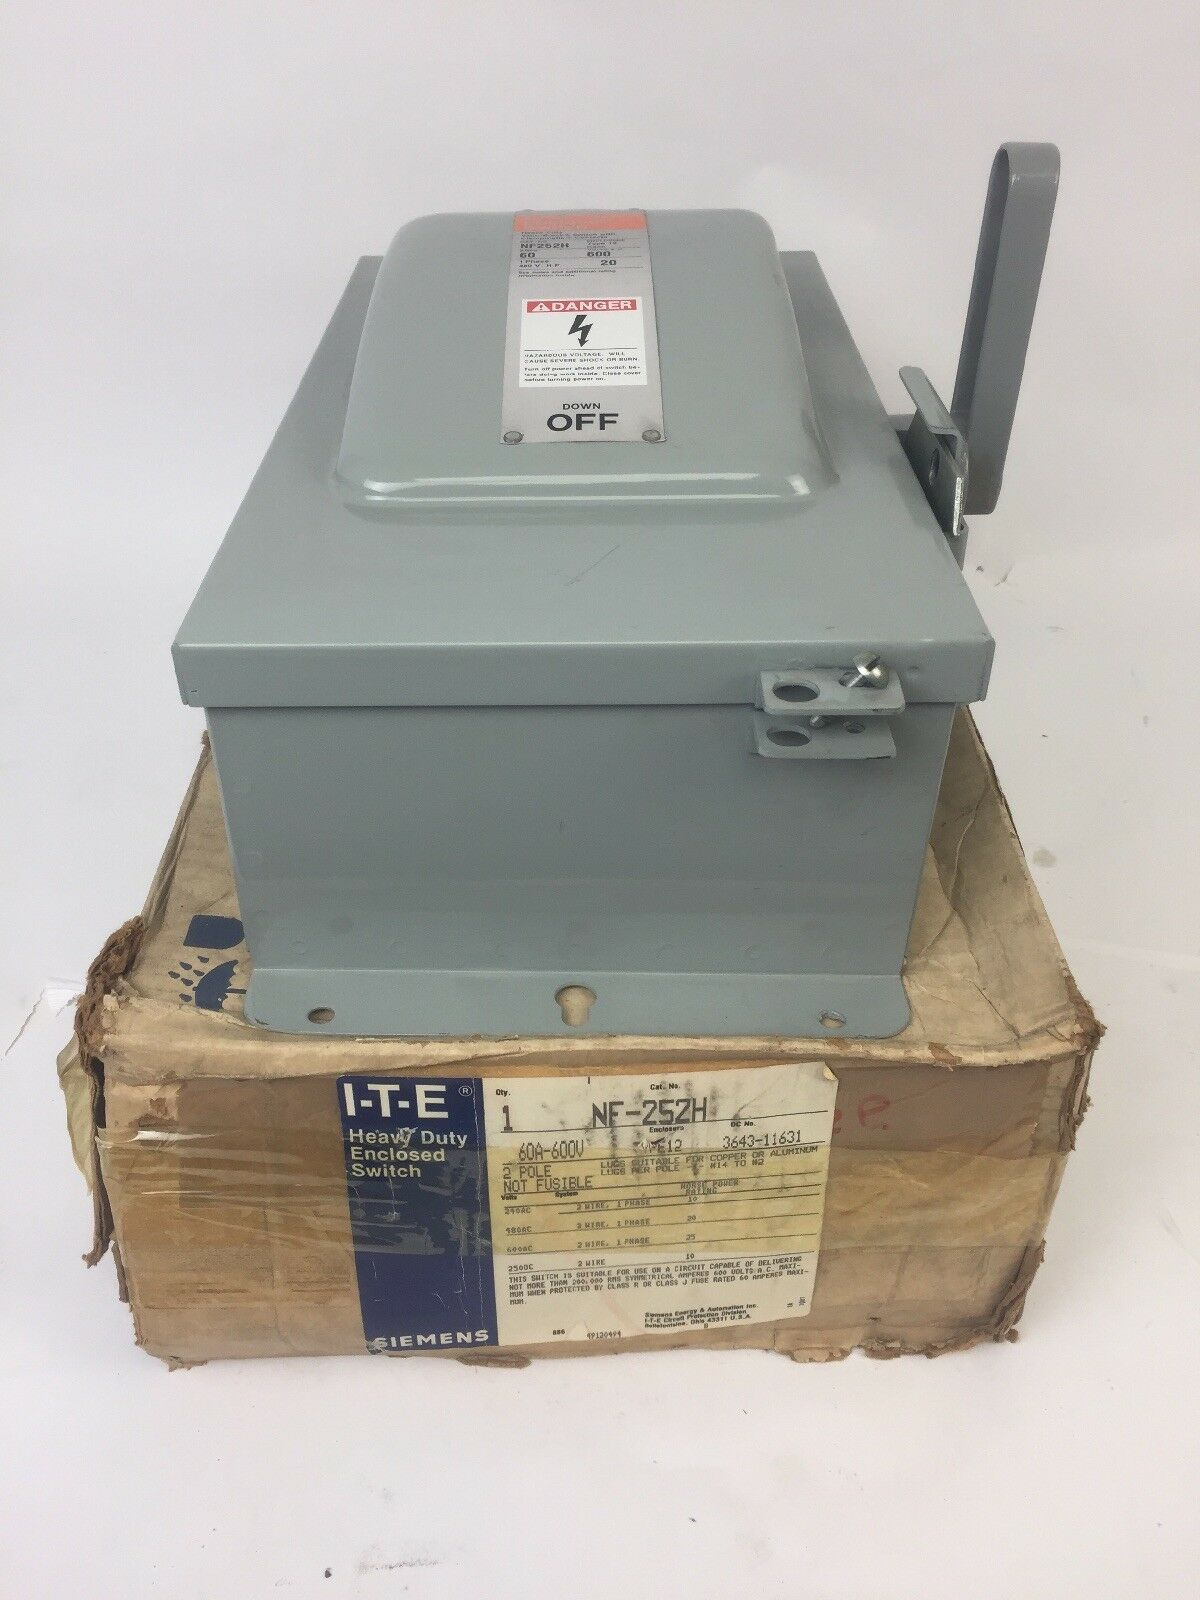 I-T-E SIEMENS NF252H HEAVY DUTY ENCLOSED SWITCH 60A 600VAC 2 POLE NON-FUSIBLE